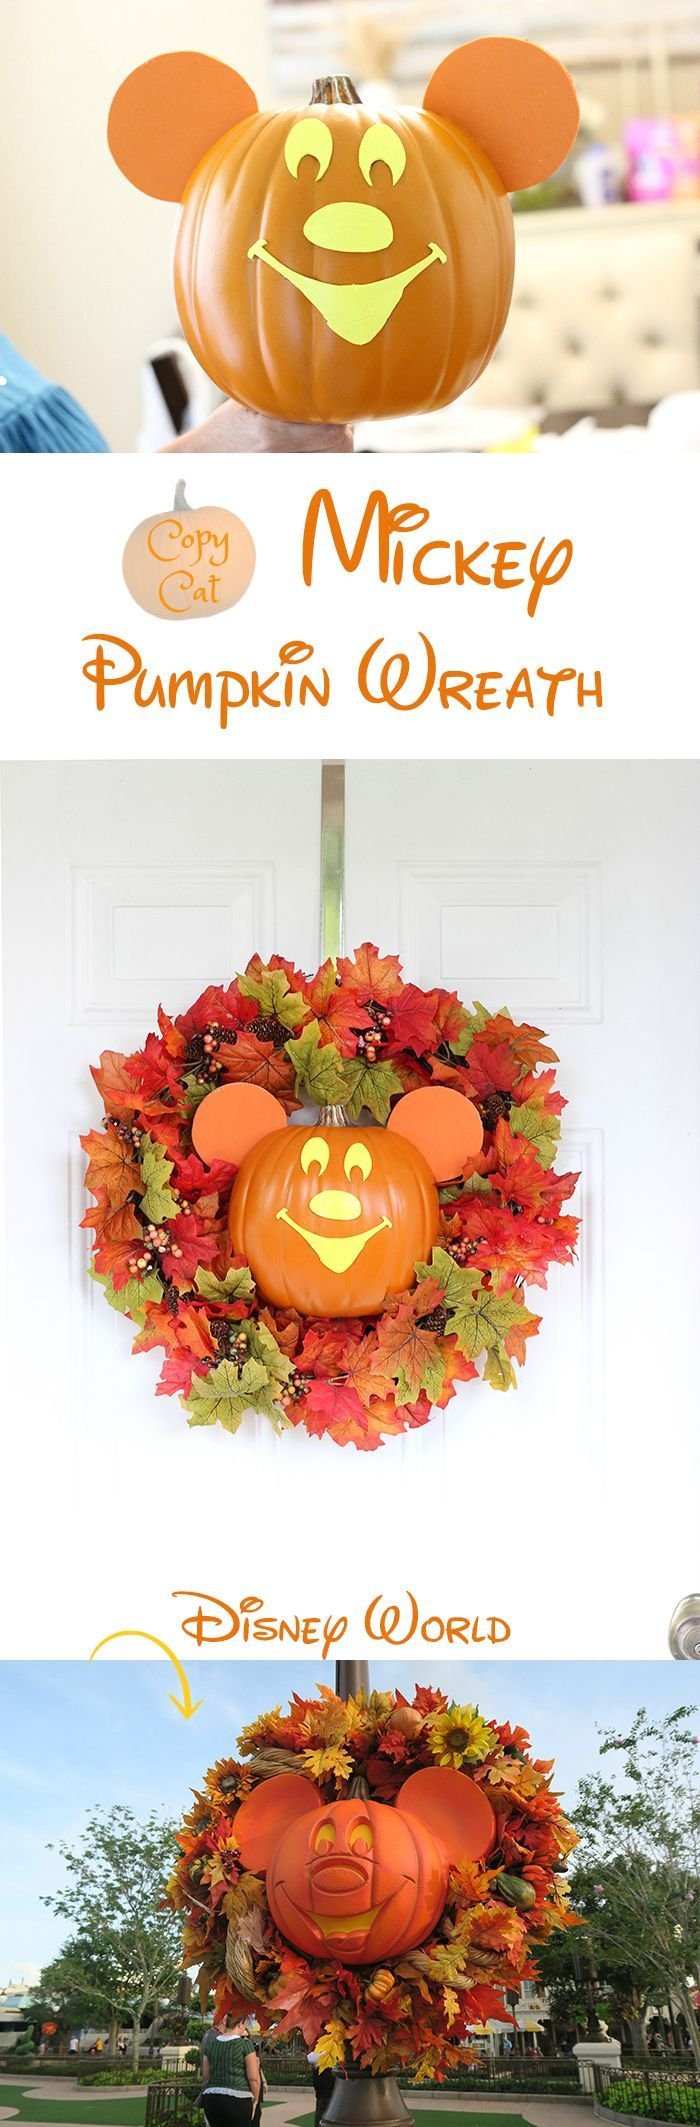 Mickey Halloween Wreath DIY. Copy Cat from Disney World, Mickey's Not So Scary Halloween Party.